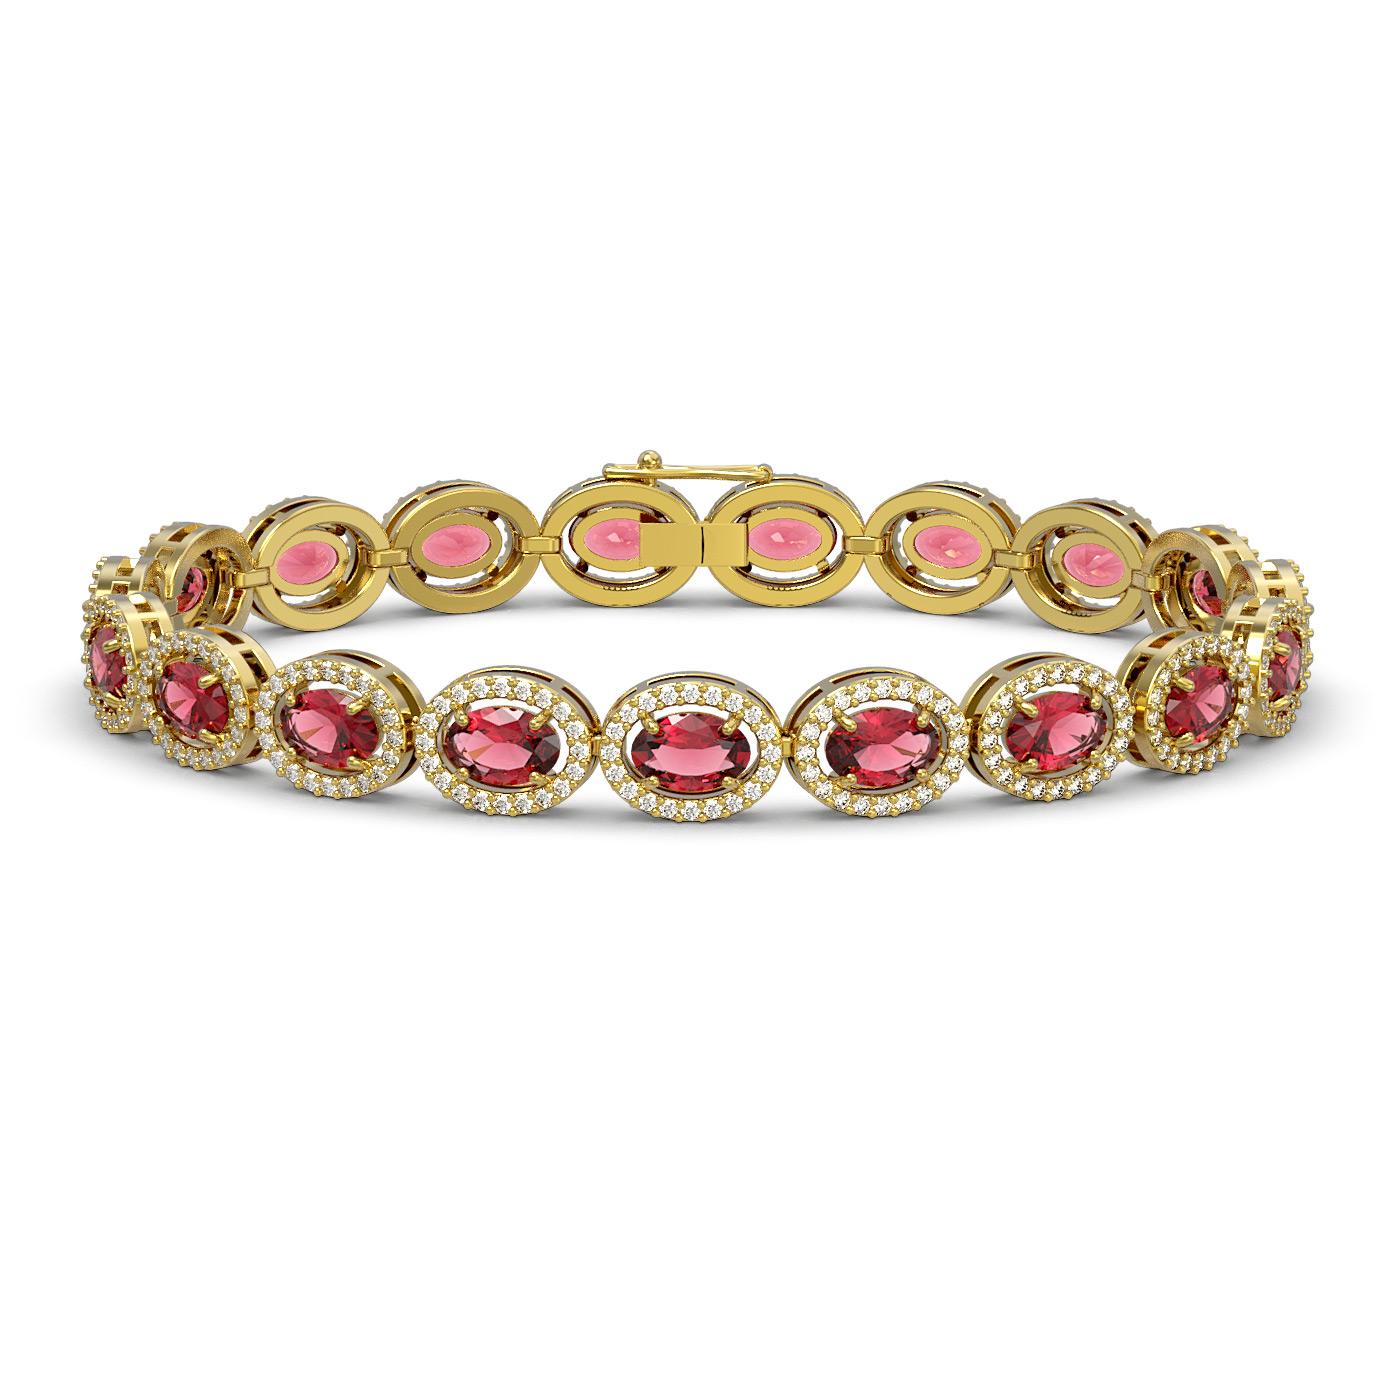 13.87 Ctw Tourmaline & Diamond Bracelet Yellow Gold